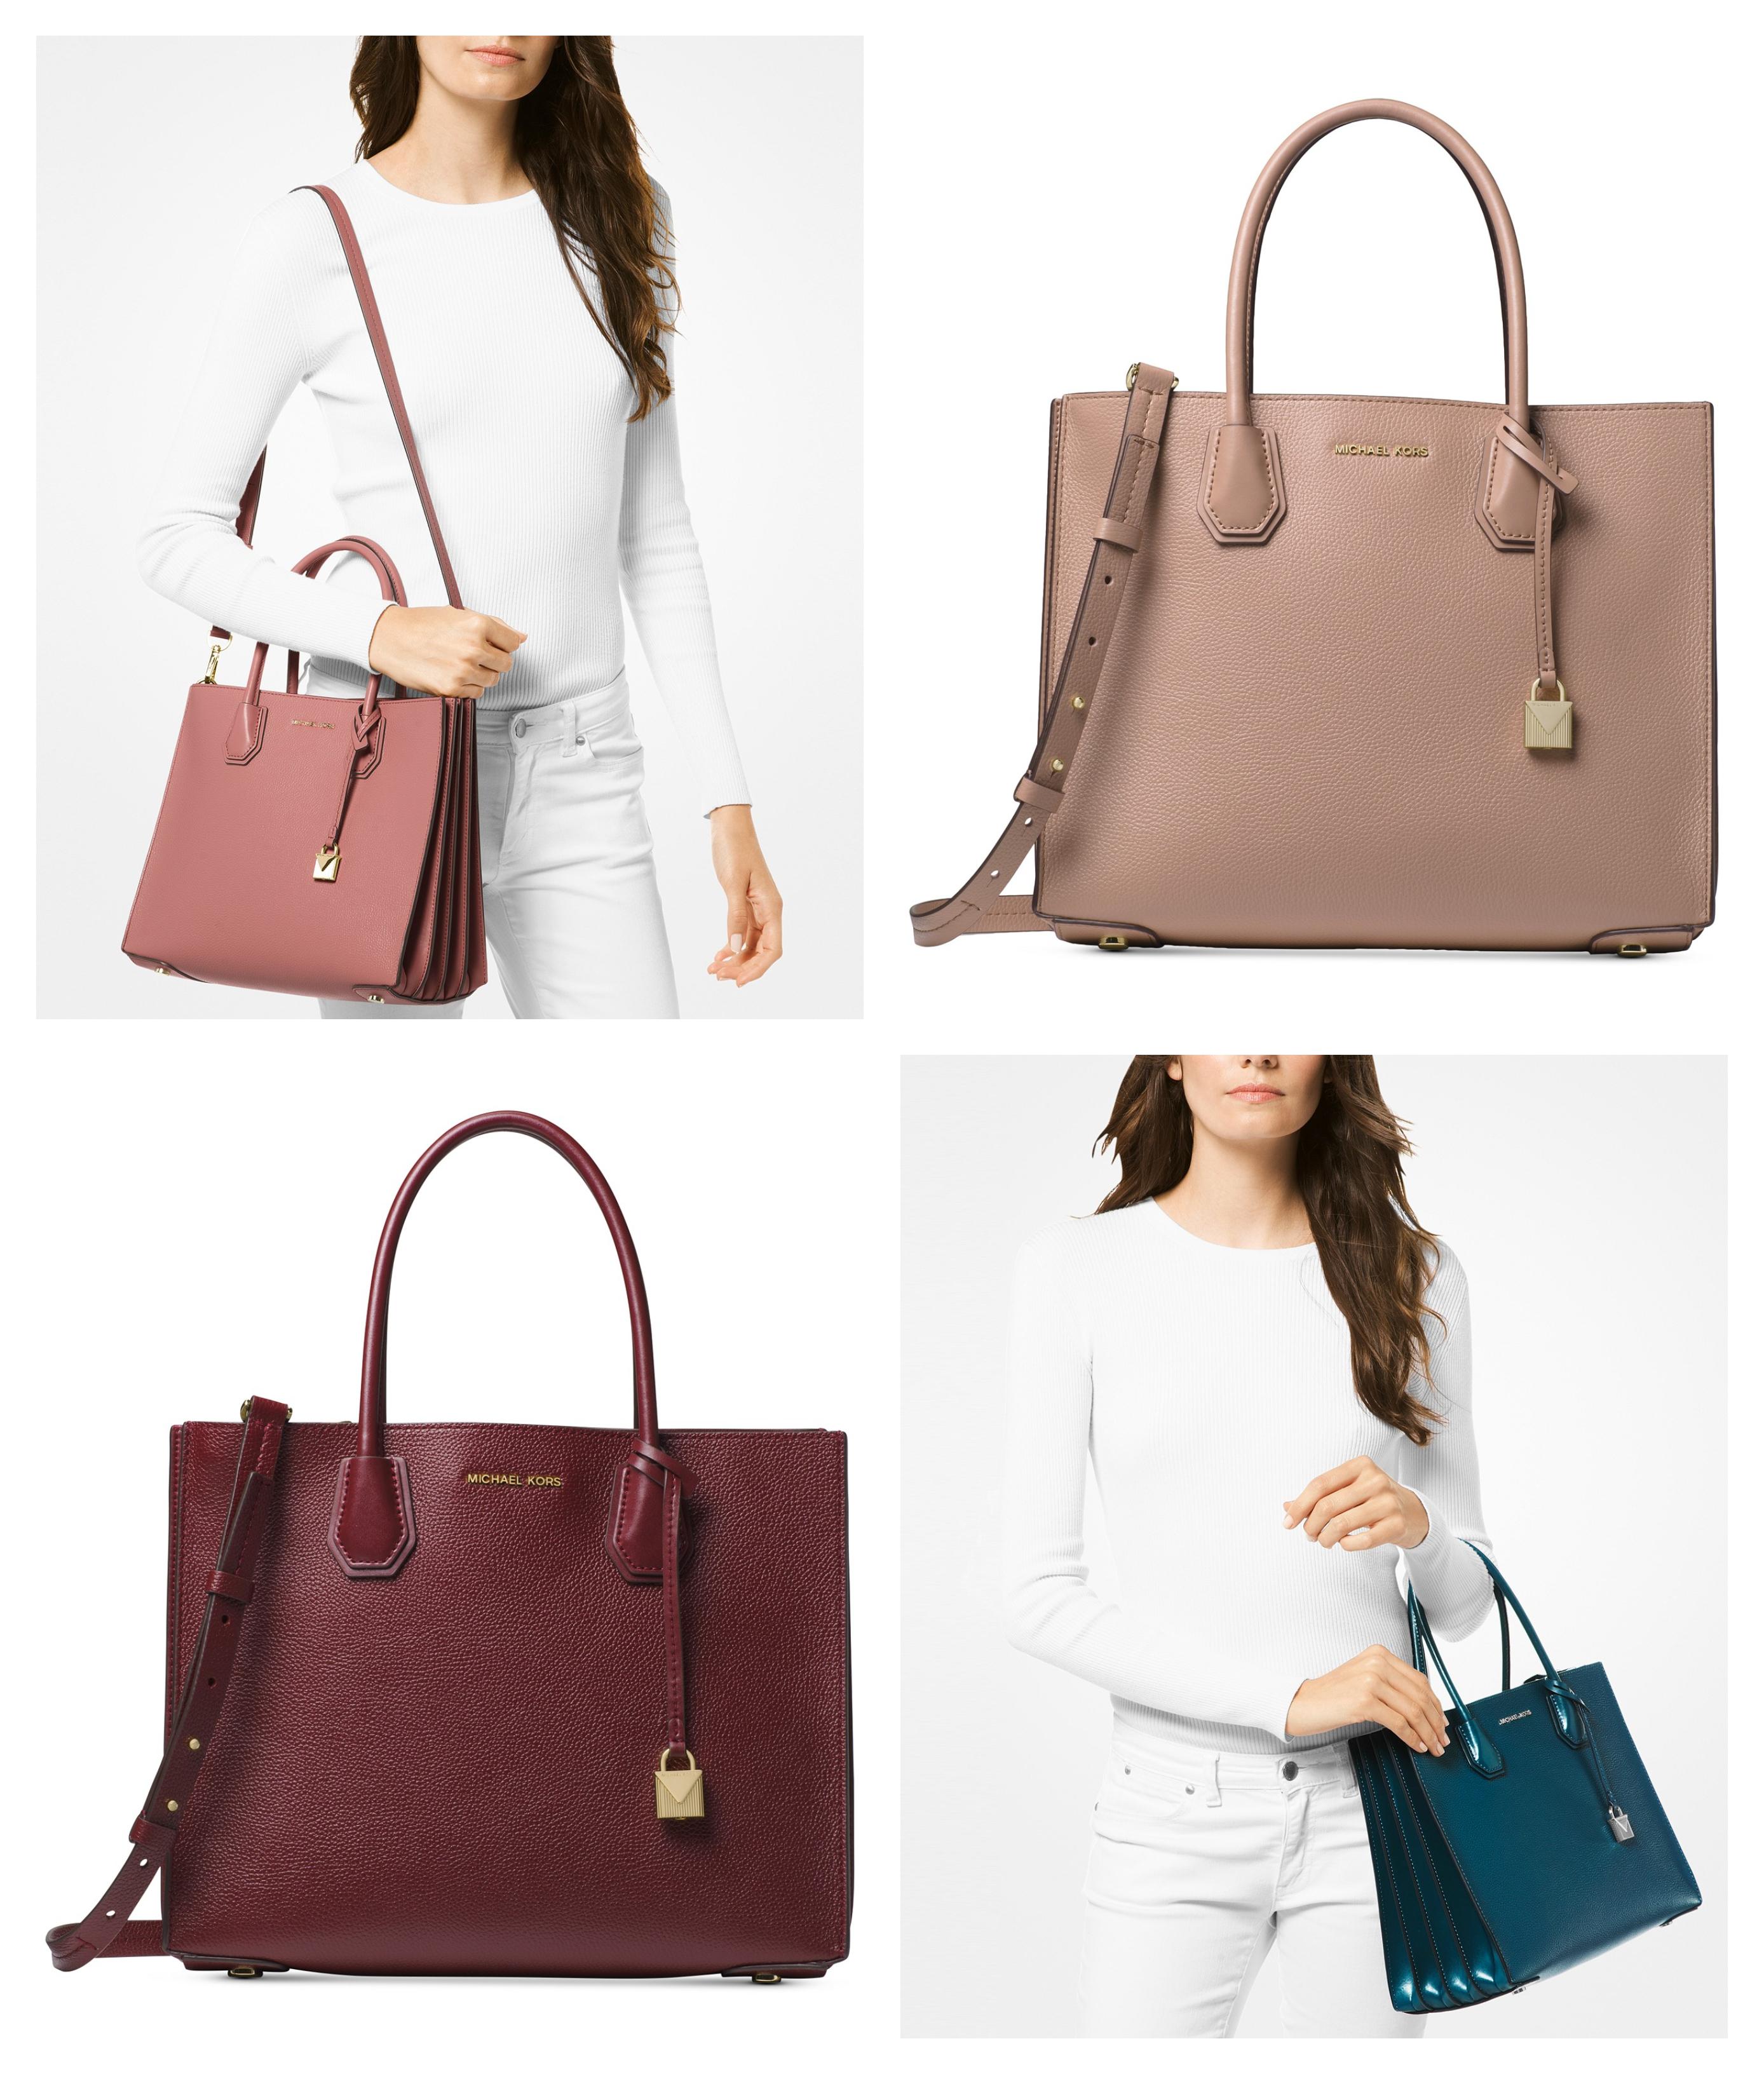 58f942dfa896 Macy s  Michael Kors Bags – 60% Off! – Wear It For Less